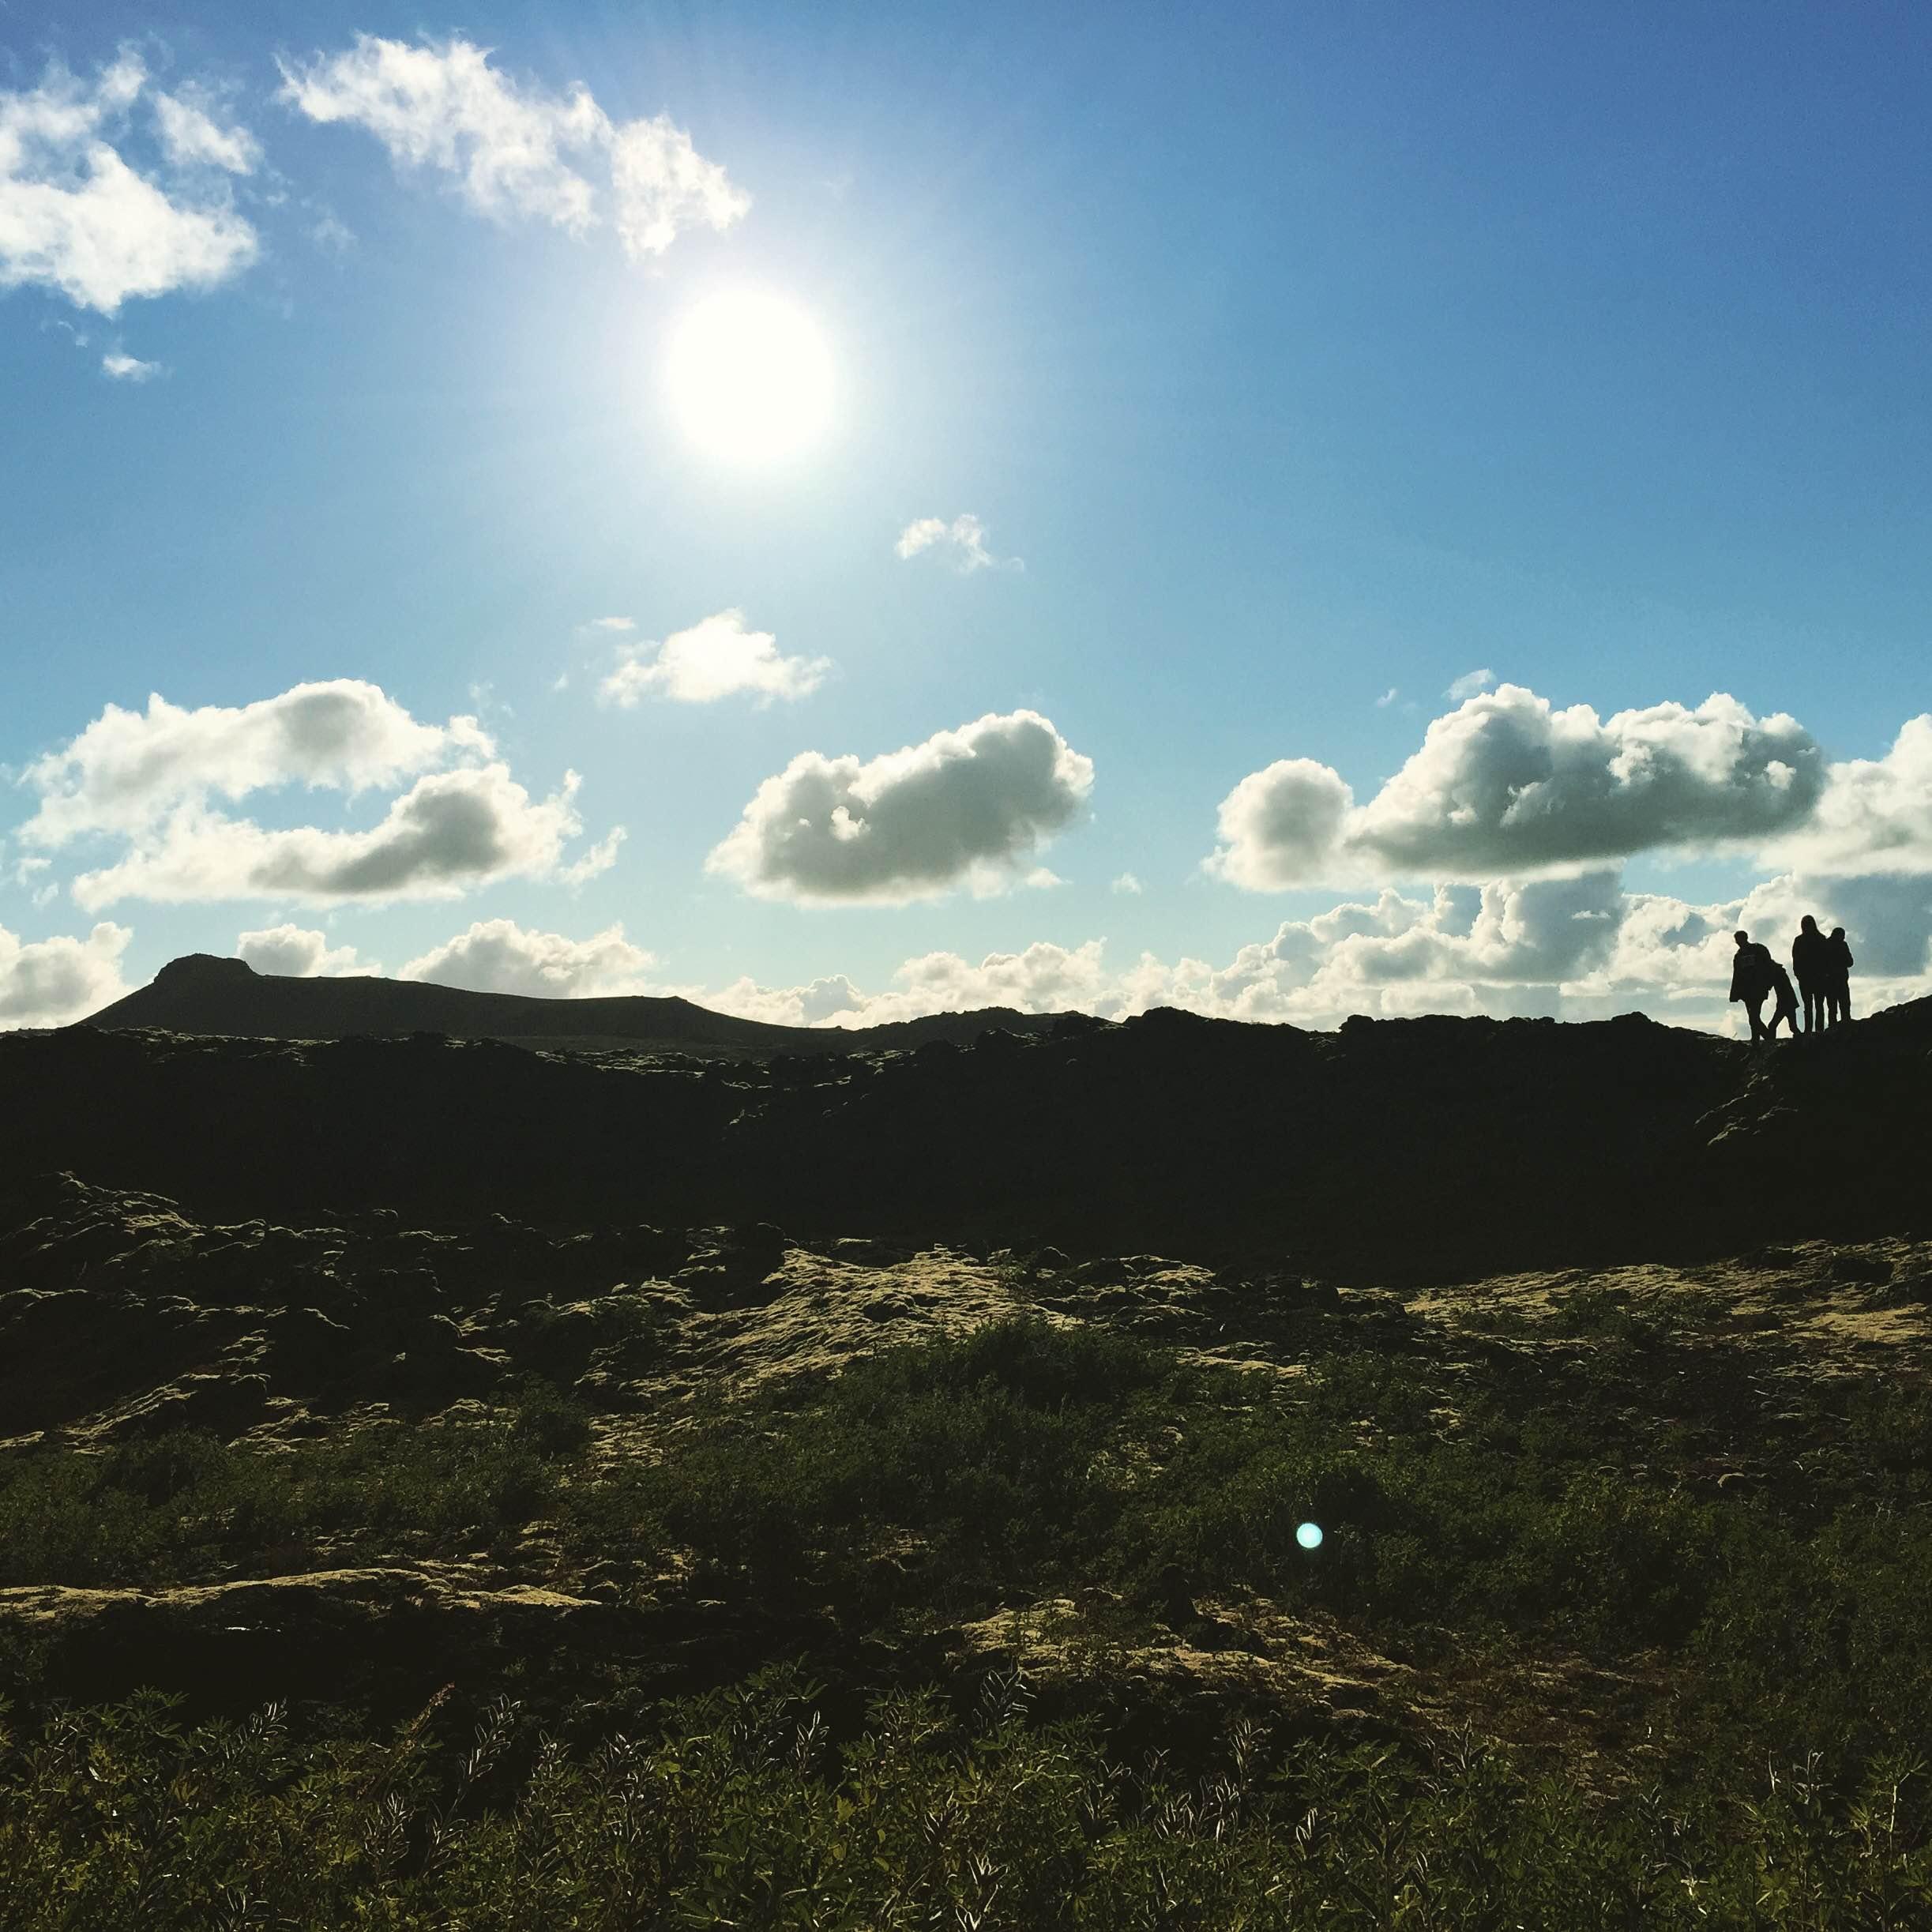 Vice_Iceland4.jpg